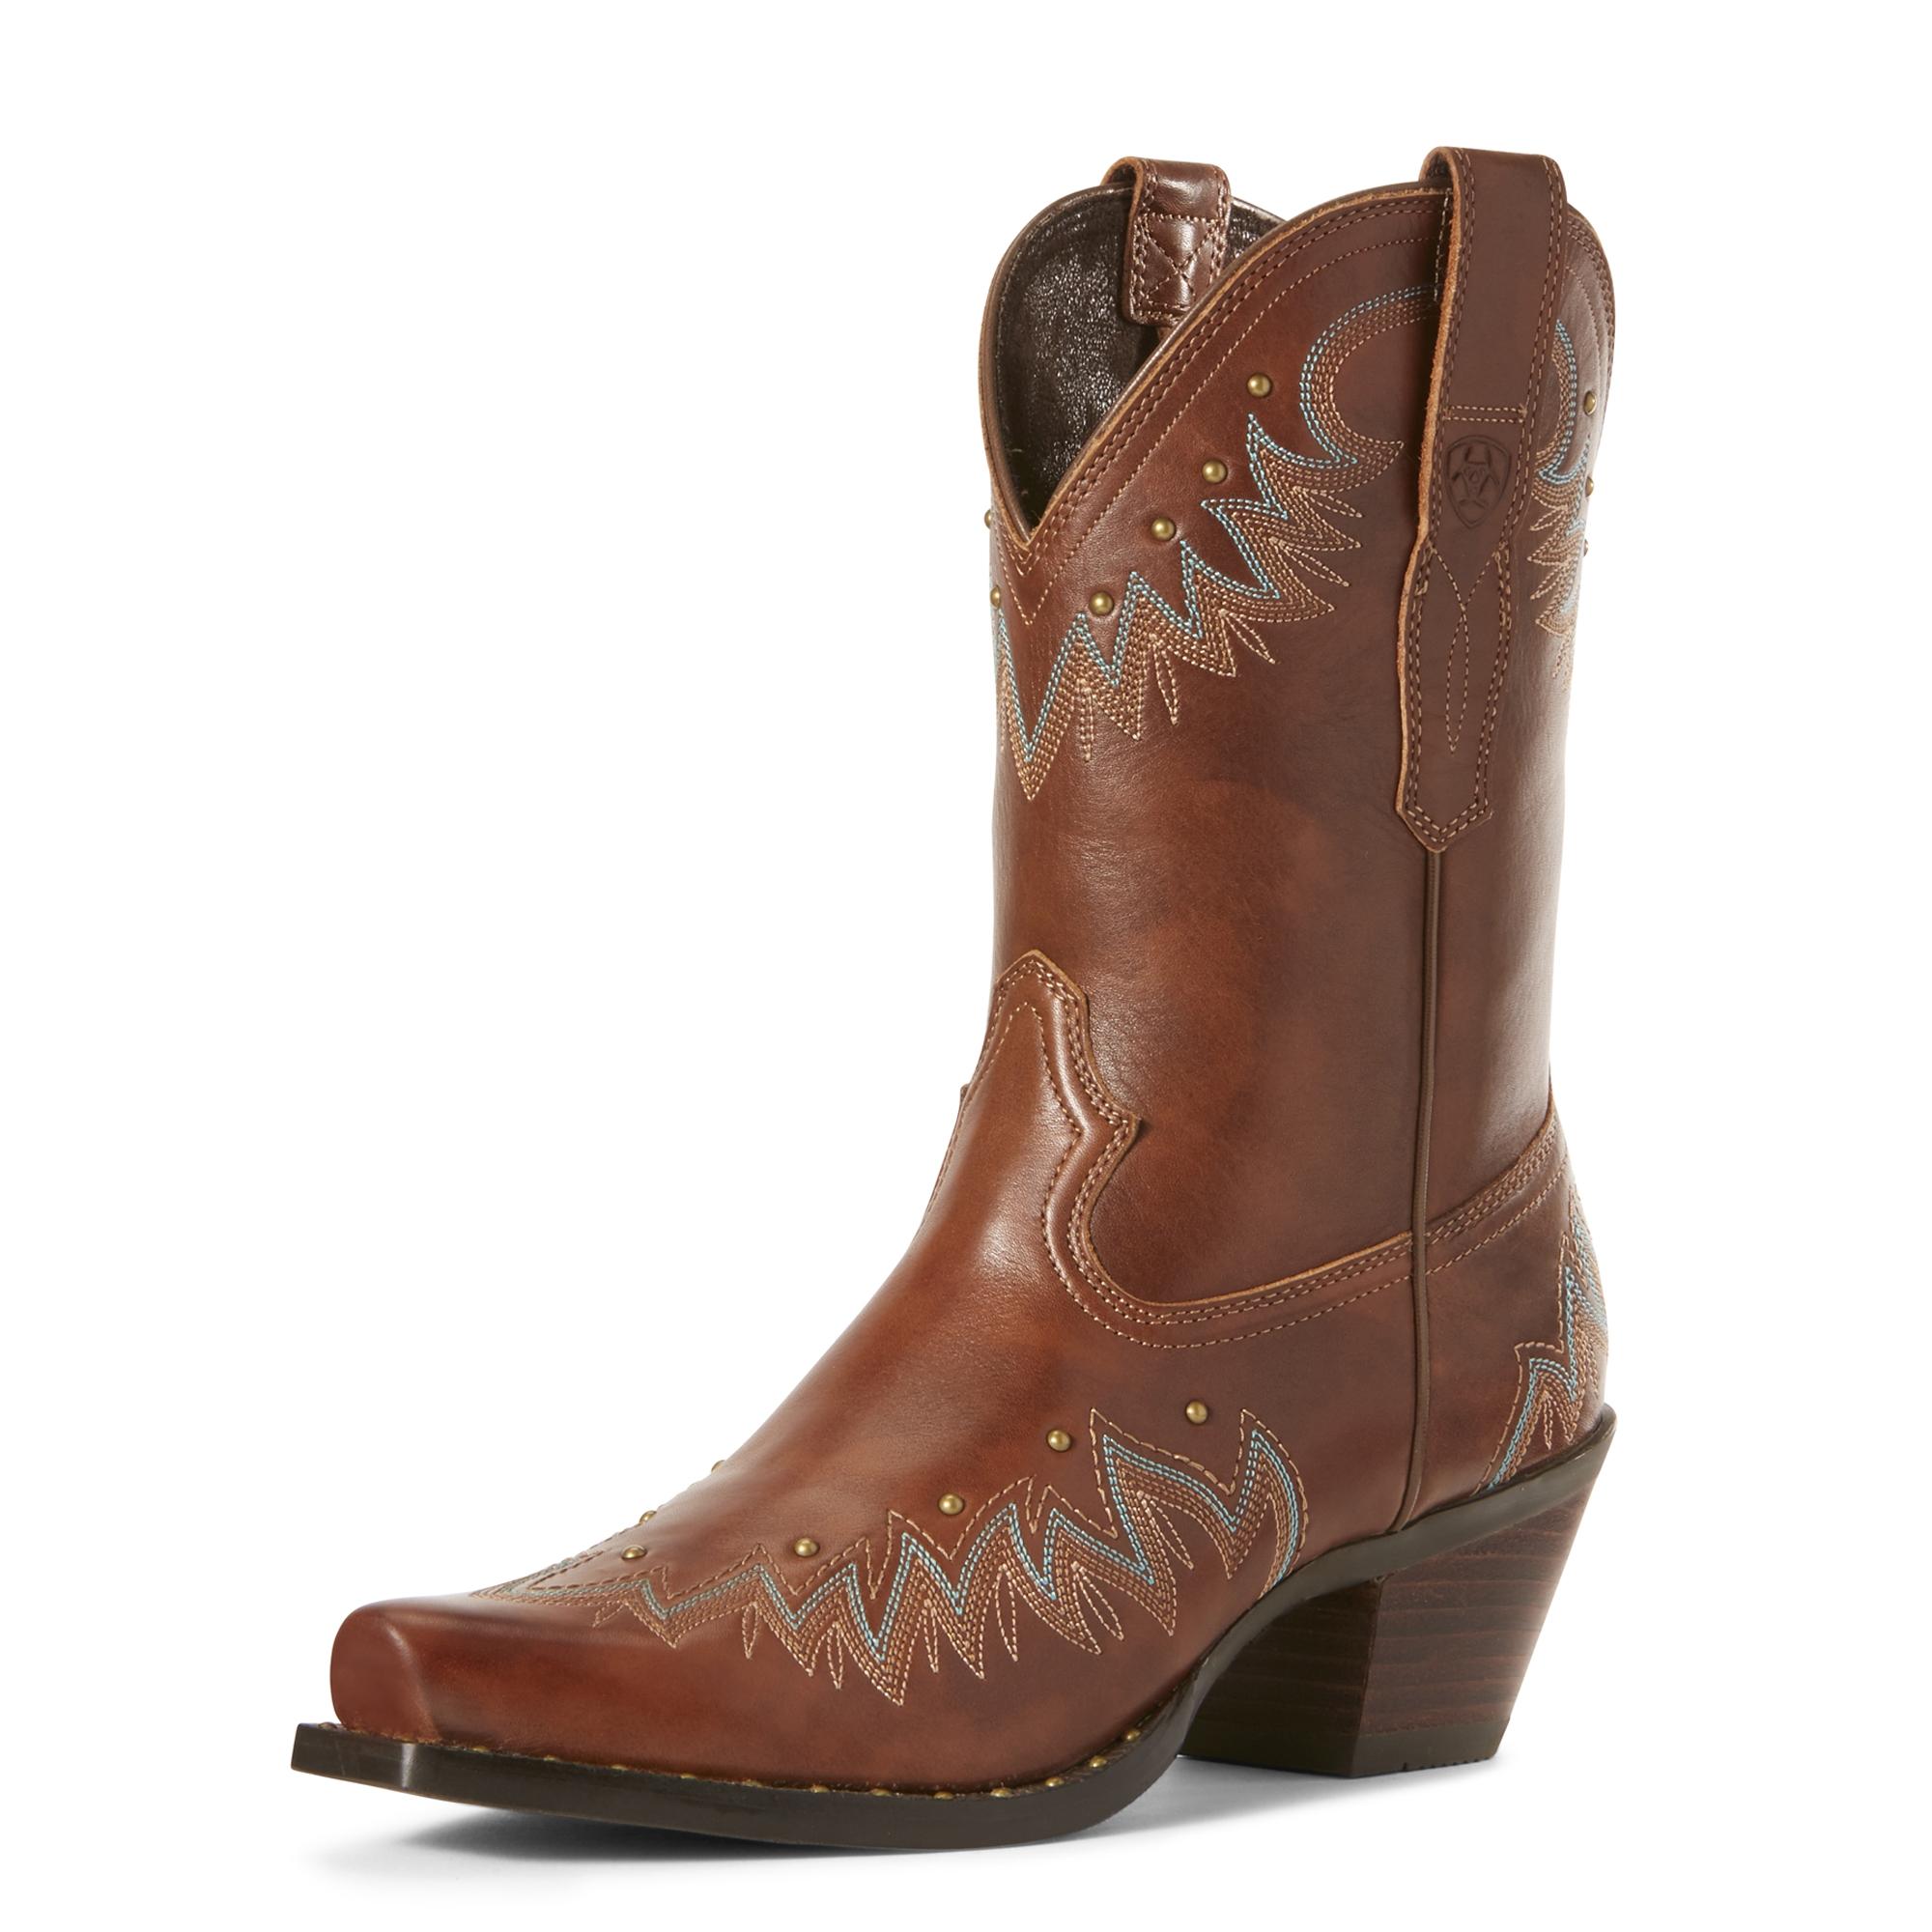 Ariat Ladies Potrero Western Boots